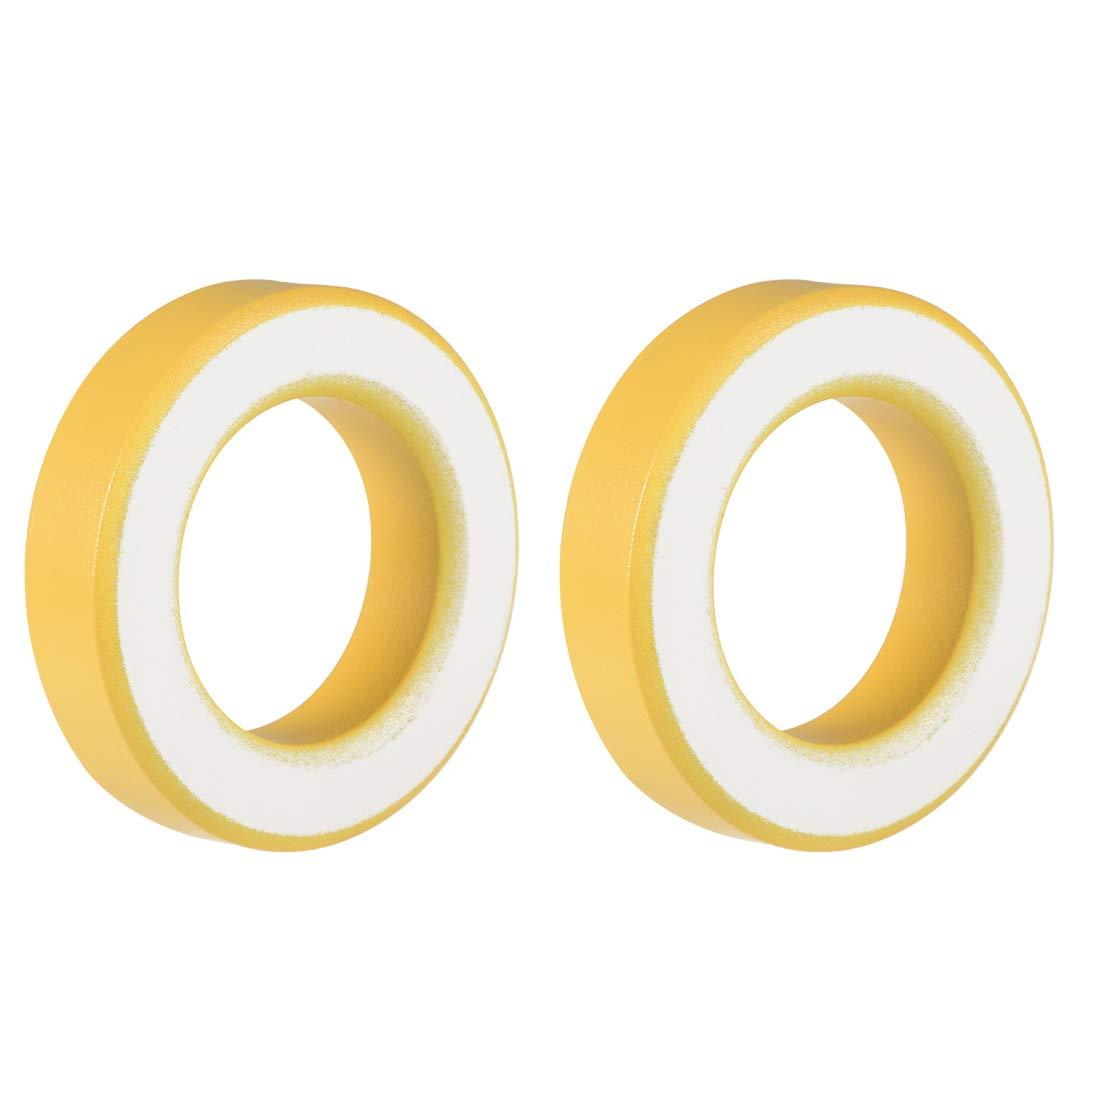 uxcell 2pcs 35.4 x 57.7 x 14mm Ferrite Ring Iron Powder Toroid Cores Yellow White